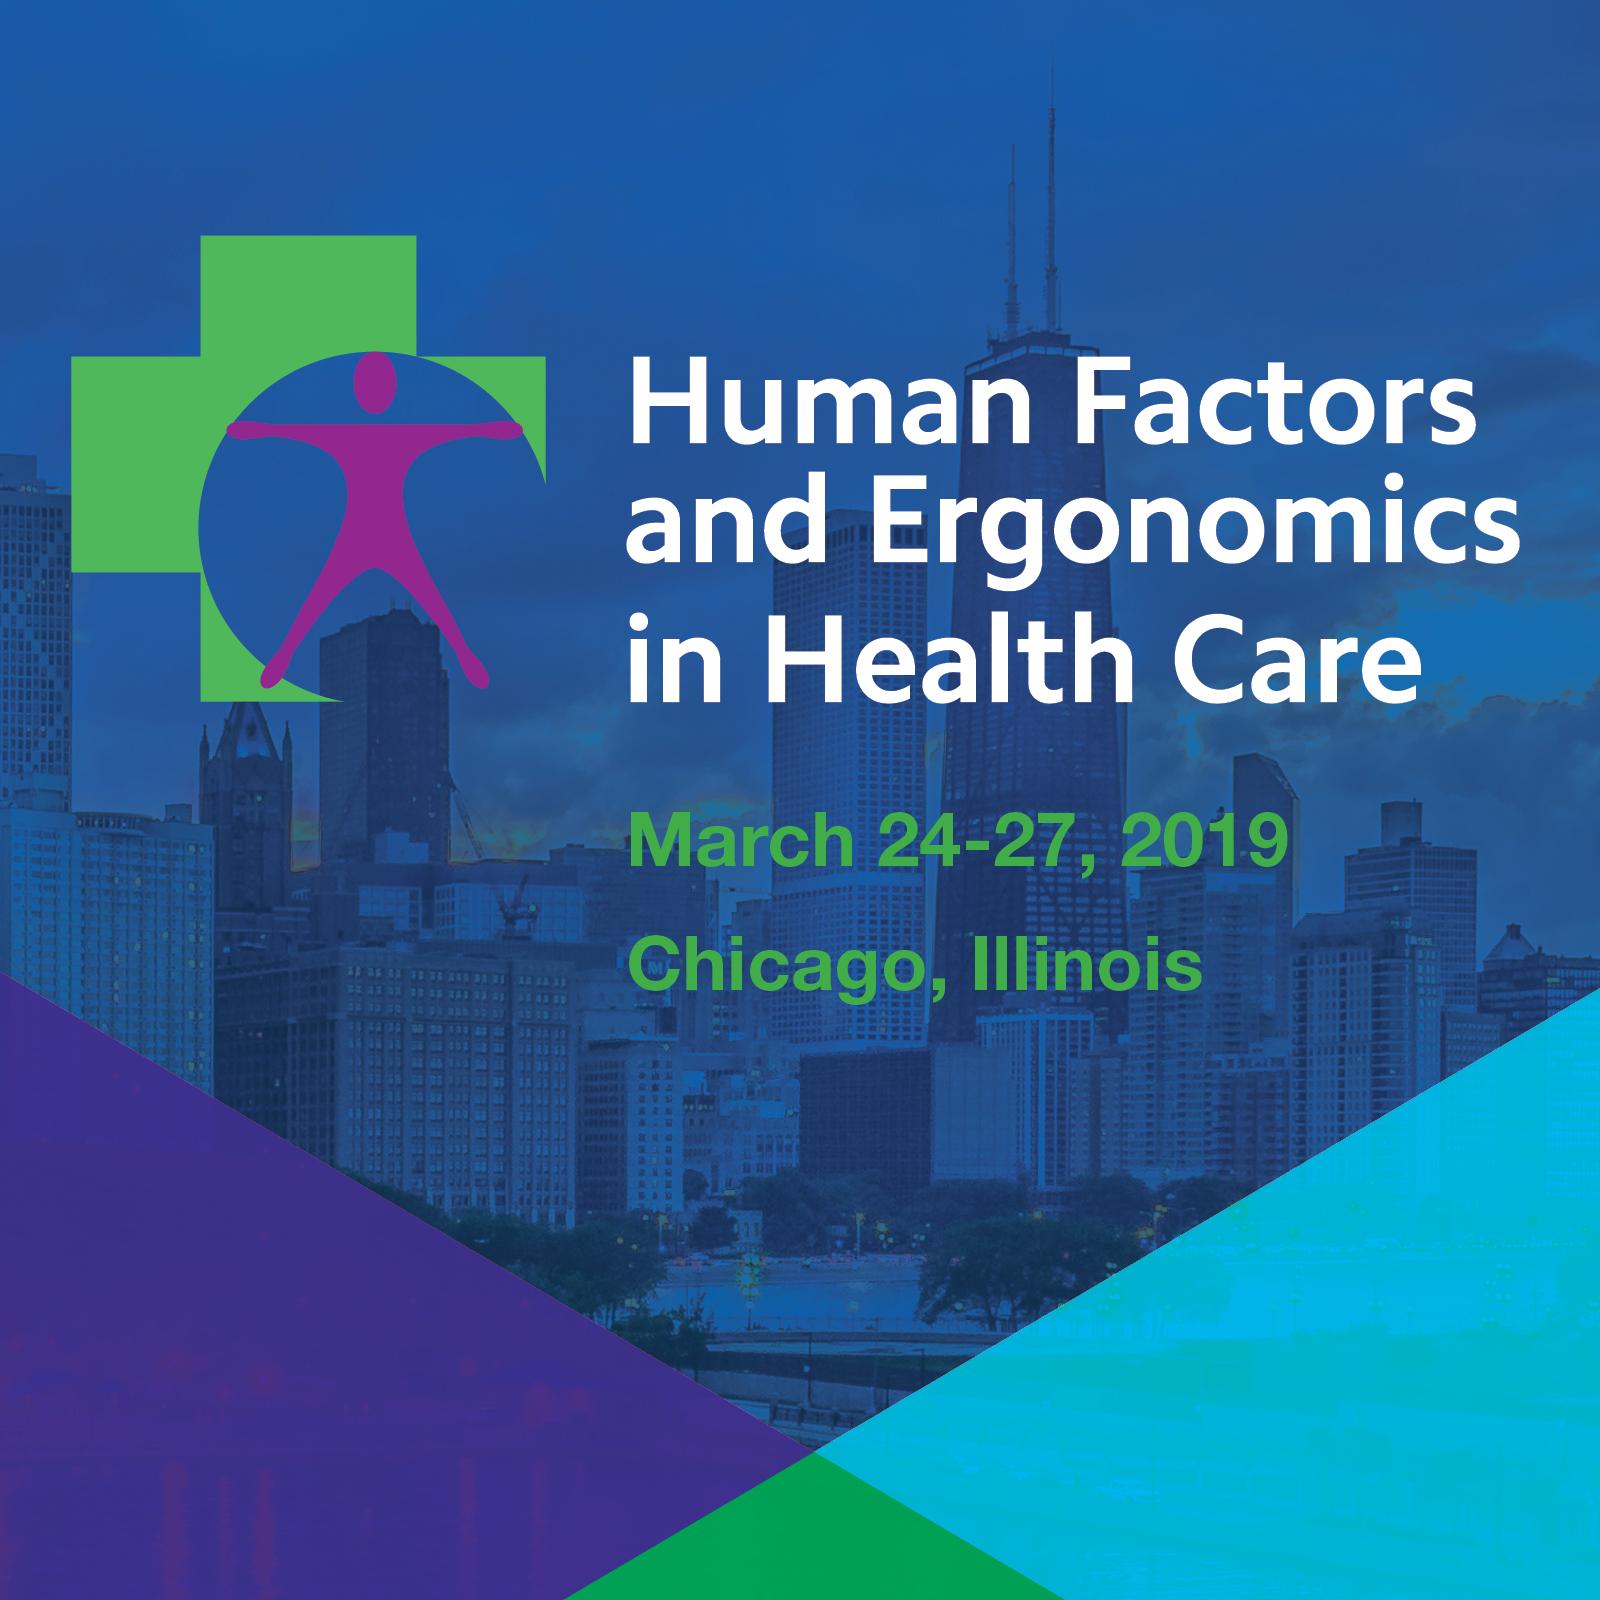 HFES 2019 Healthcare Symposium